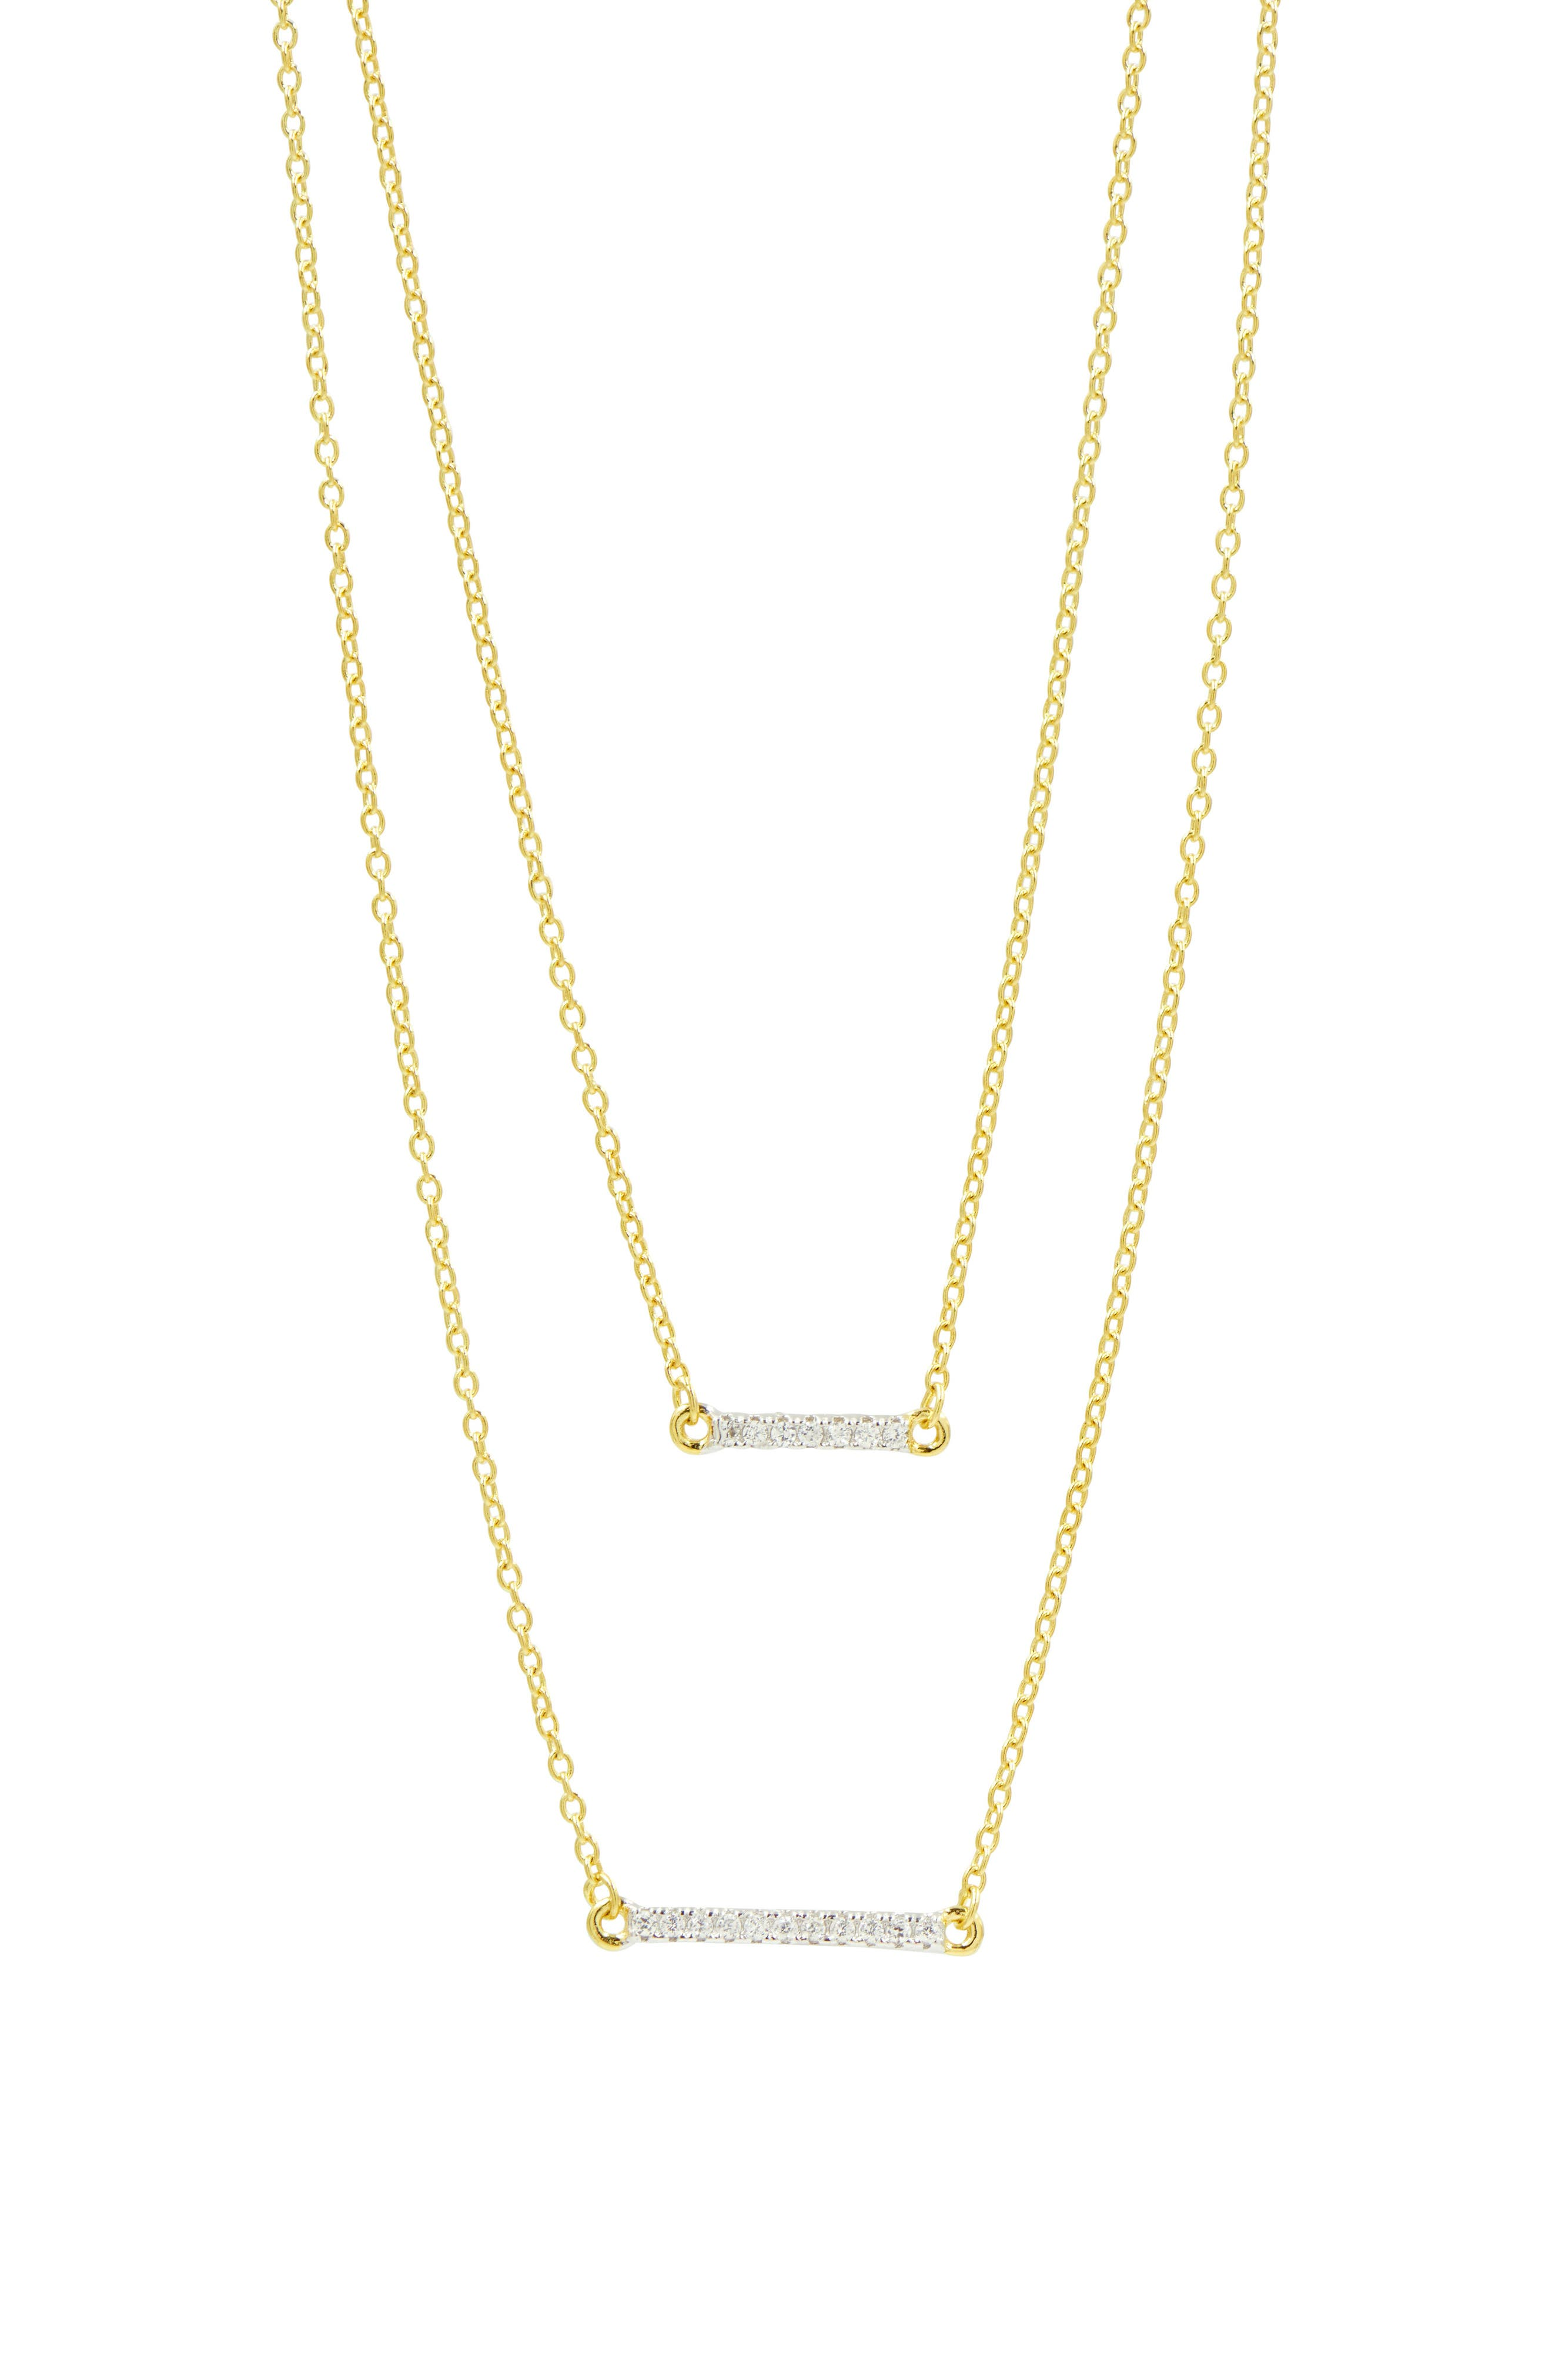 FREIDA ROTHMAN, Radiance Double Pendant Necklace, Main thumbnail 1, color, GOLD/ SILVER